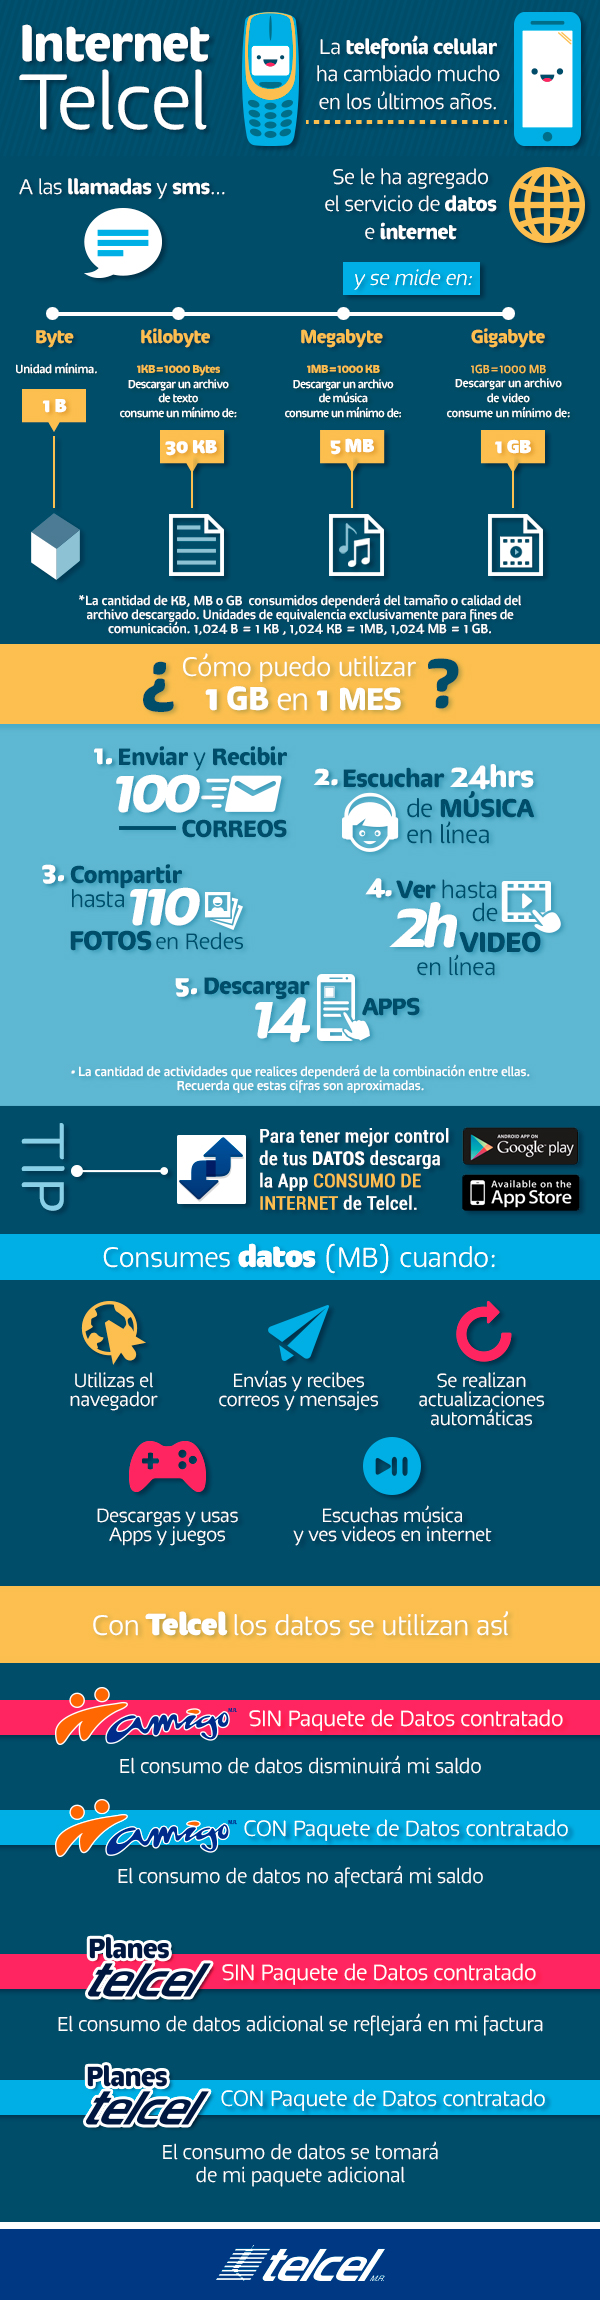 infografía-internet-Telcel